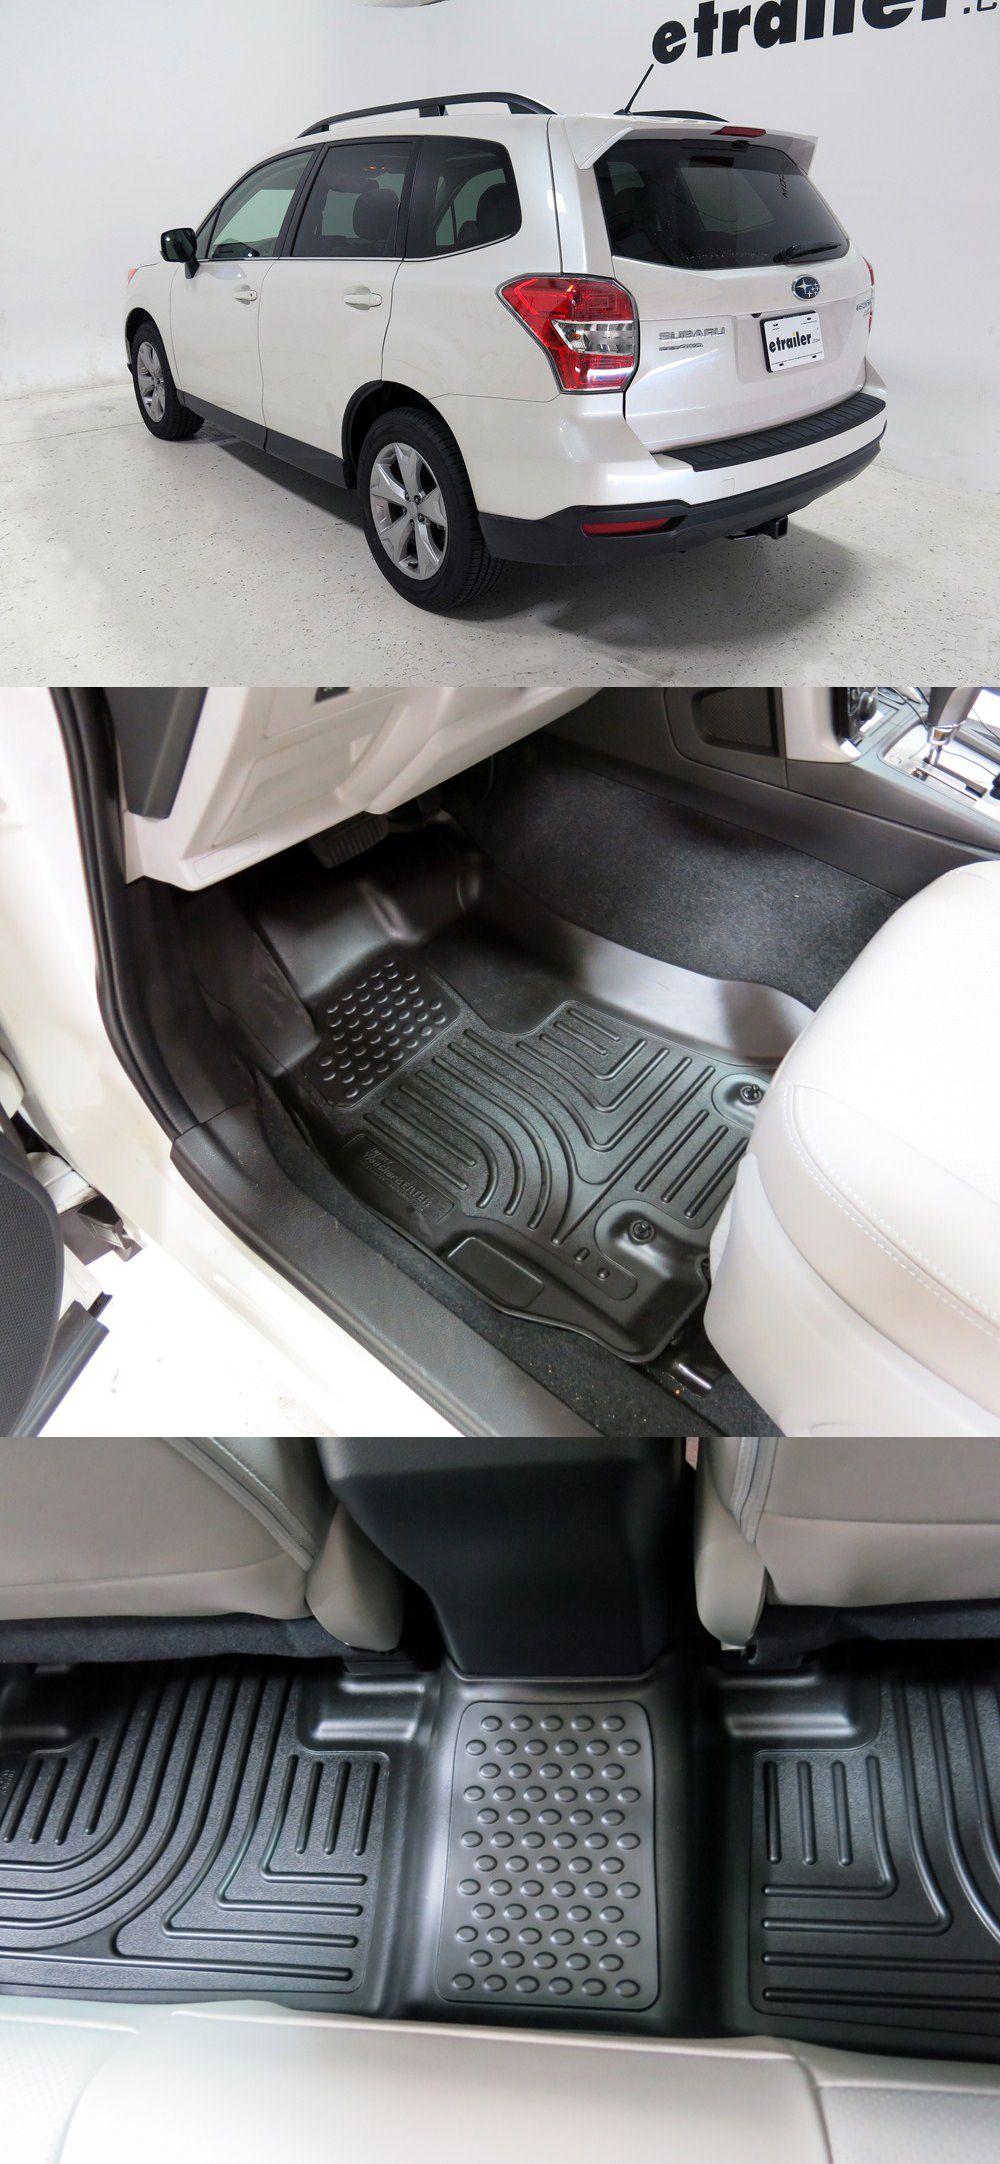 2015 Subaru Forester Floor Mats Husky Liners Subaru Forester Subaru Accessories Husky Liners